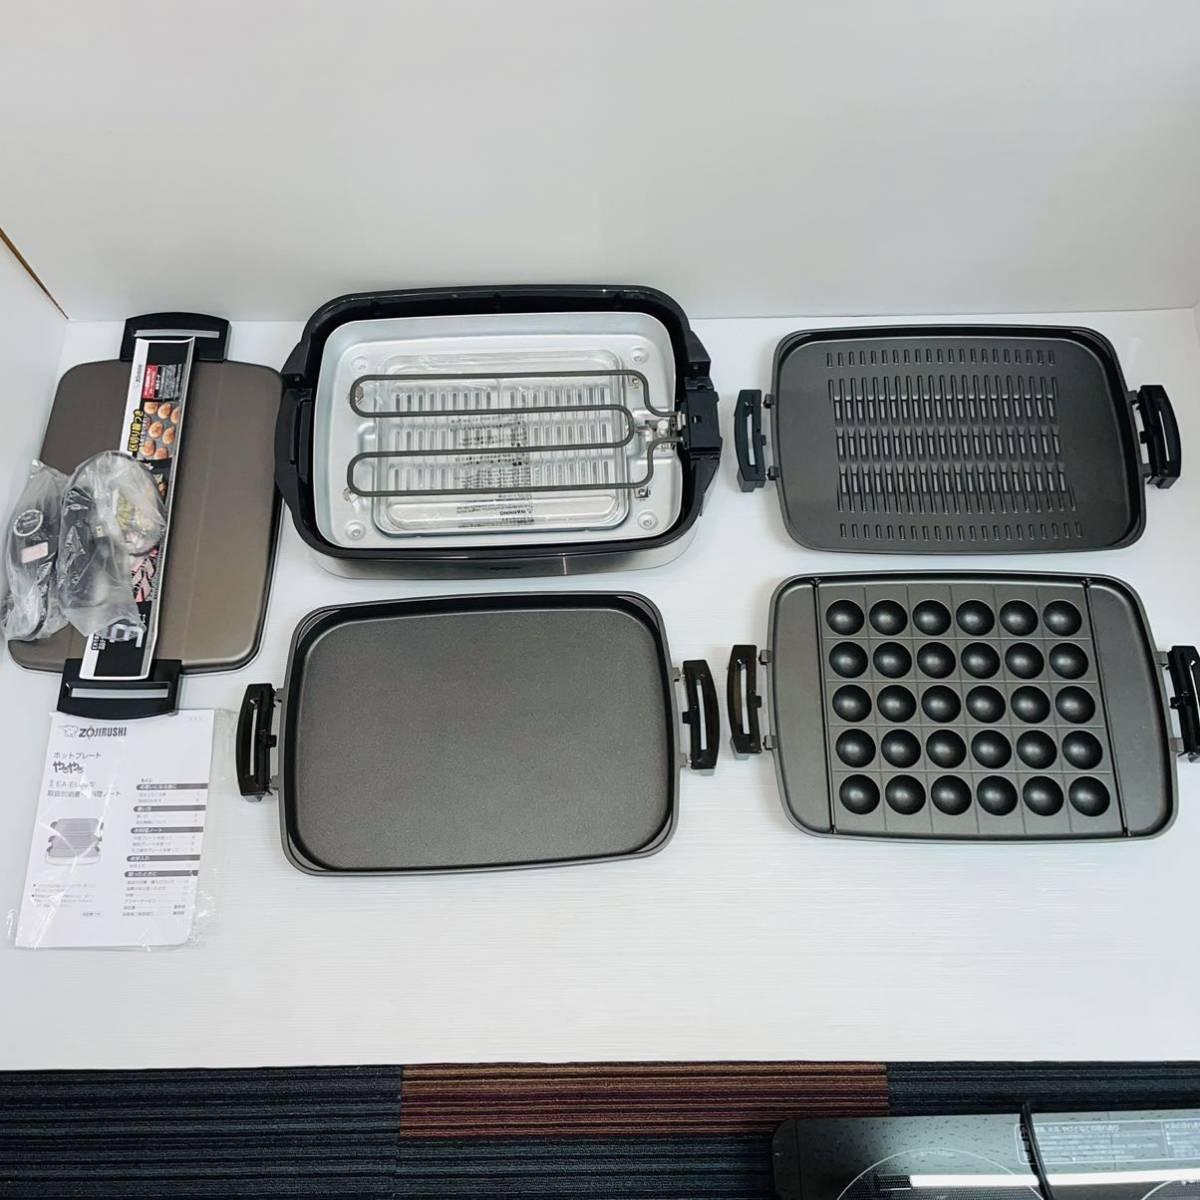 ZOJIRUSHI 象印 EA-EU30 ホットプレート 焼肉プレート たこ焼き タコパ ホットケーキ お好み焼き平面 _画像3